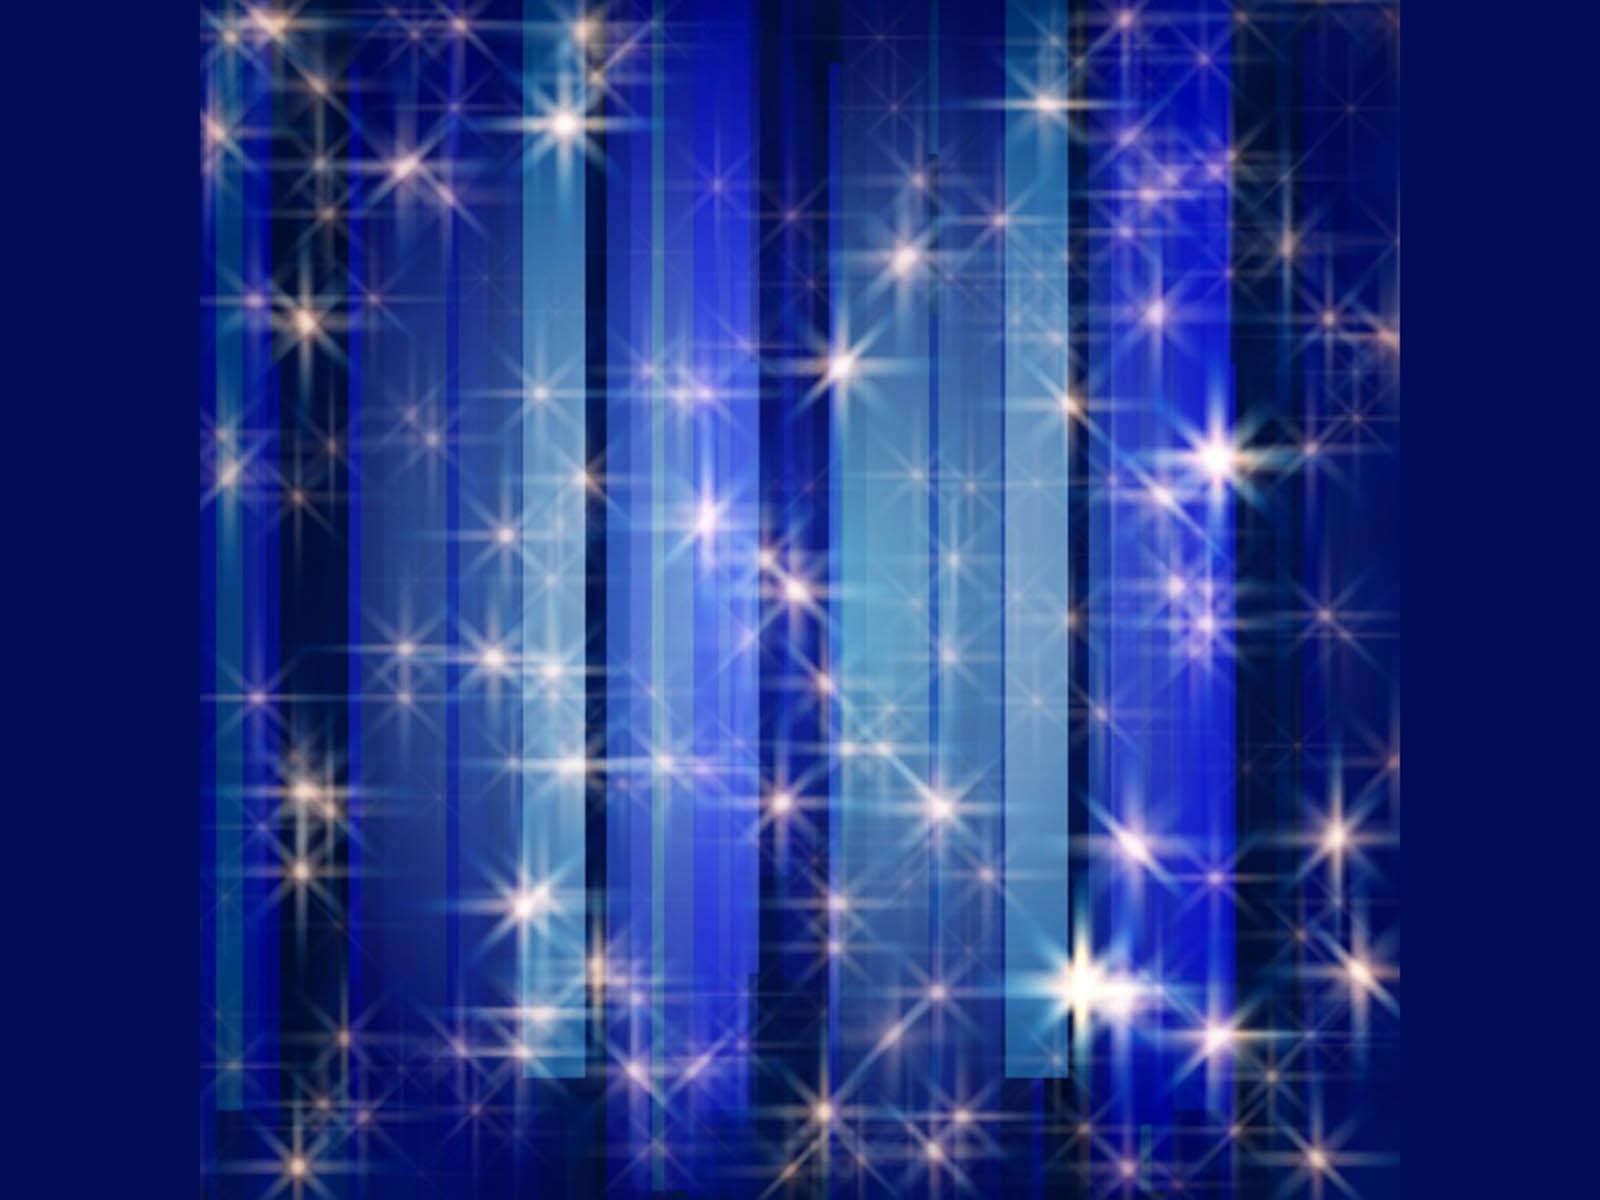 http://3.bp.blogspot.com/-ugRILQ6oYjc/UFSnB2oSv9I/AAAAAAAAKCI/afA9d9Cg0MI/s1600/3D+Stars+Wallpapers.jpg